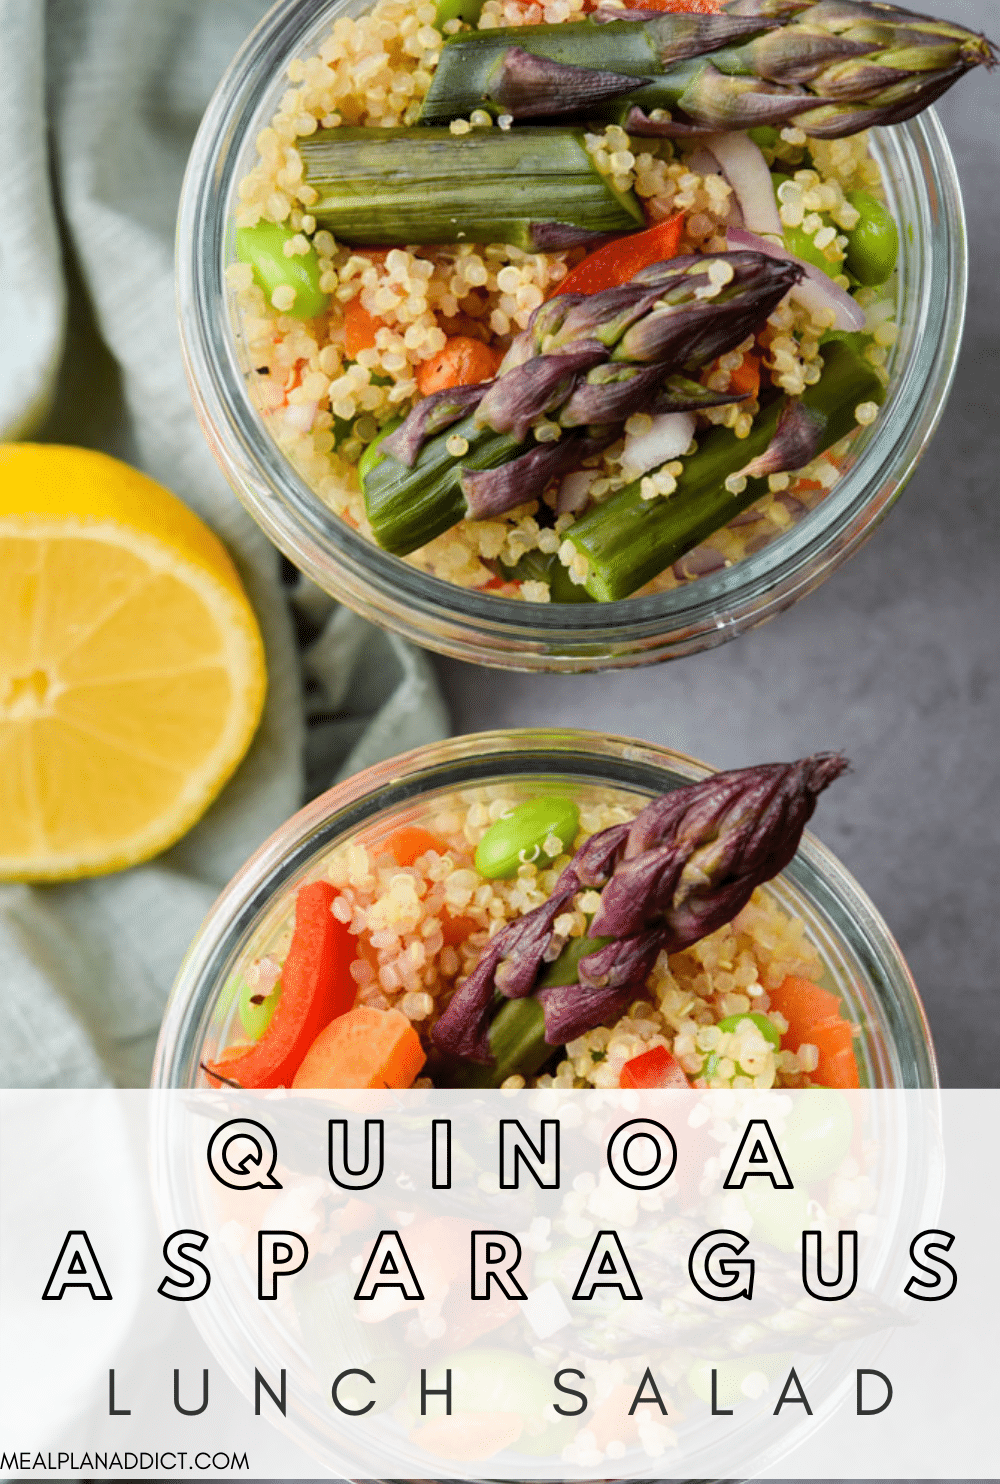 Quinoa asparagus salad pin for Pinterst